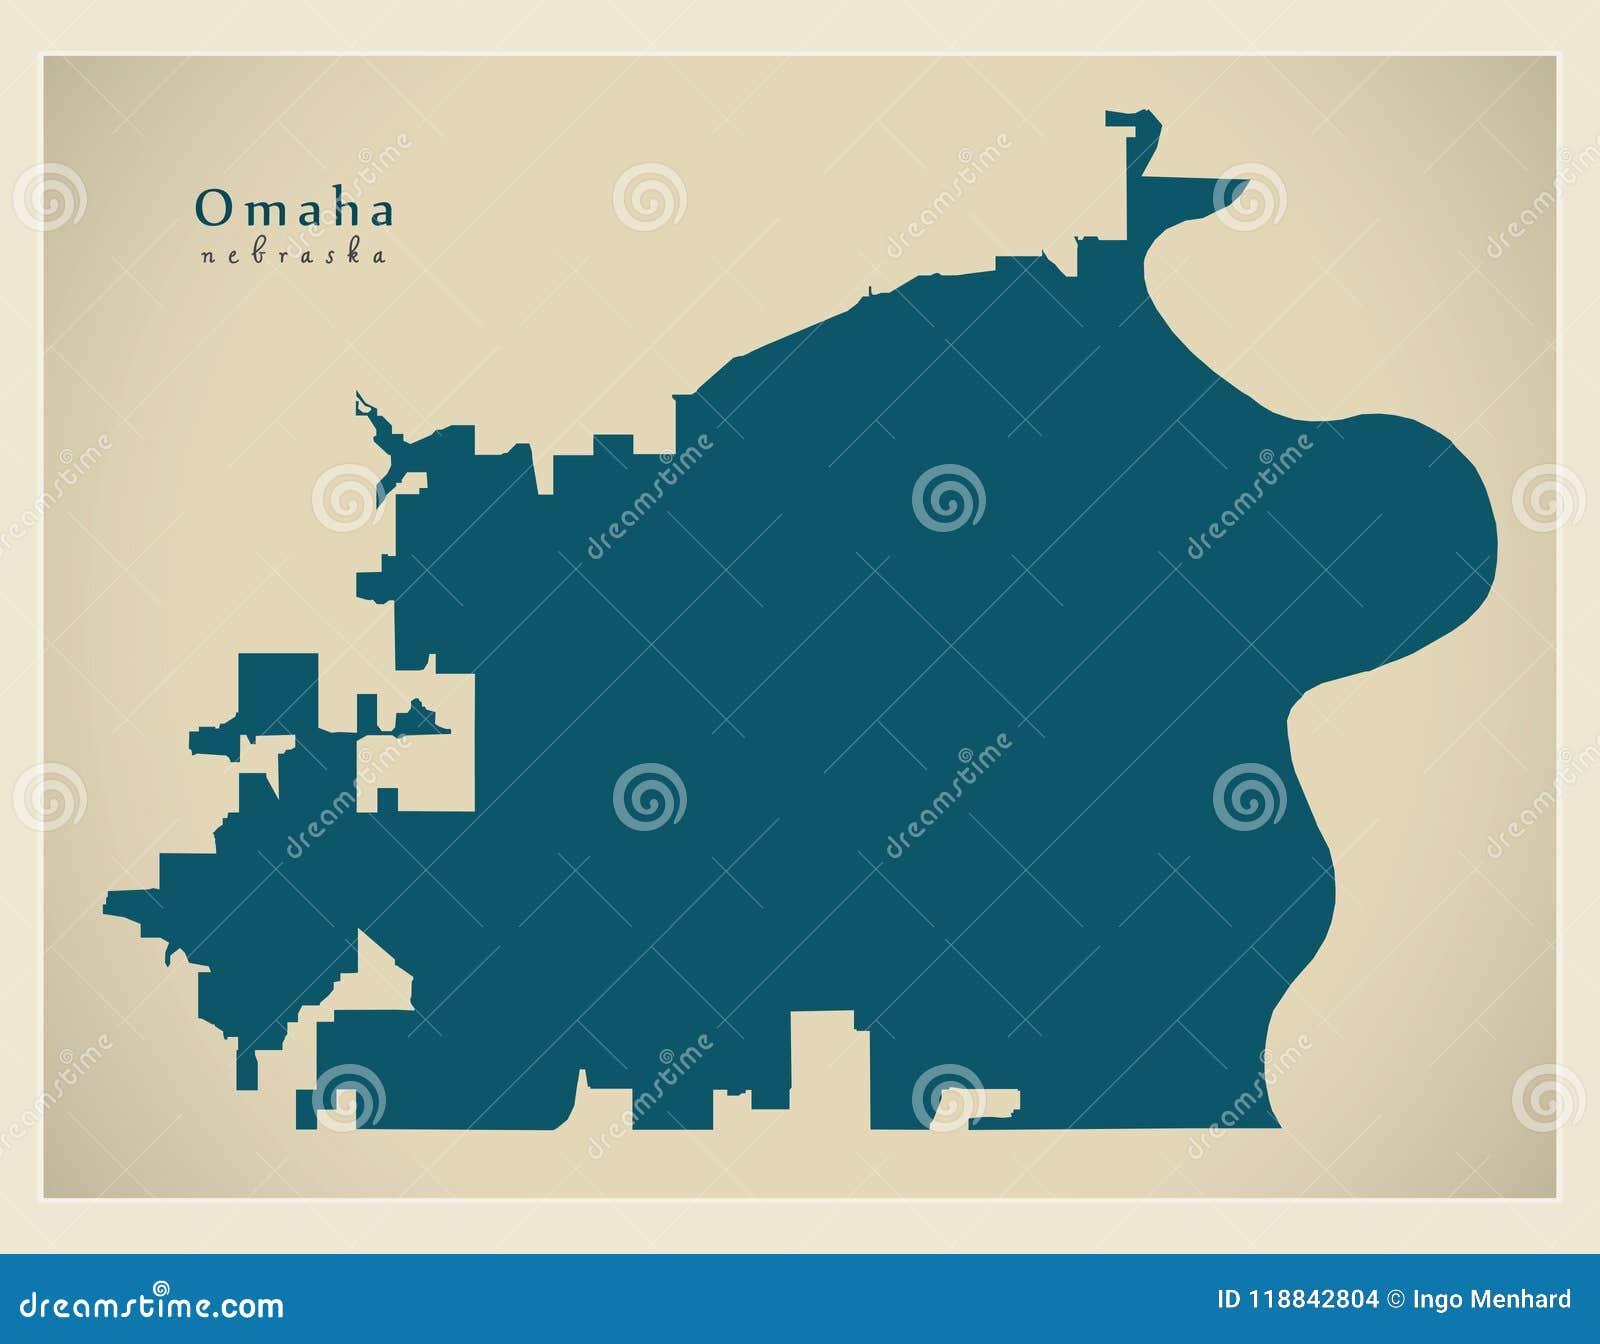 Modern Map Omaha Nebraska City Of The Usa Stock Vector